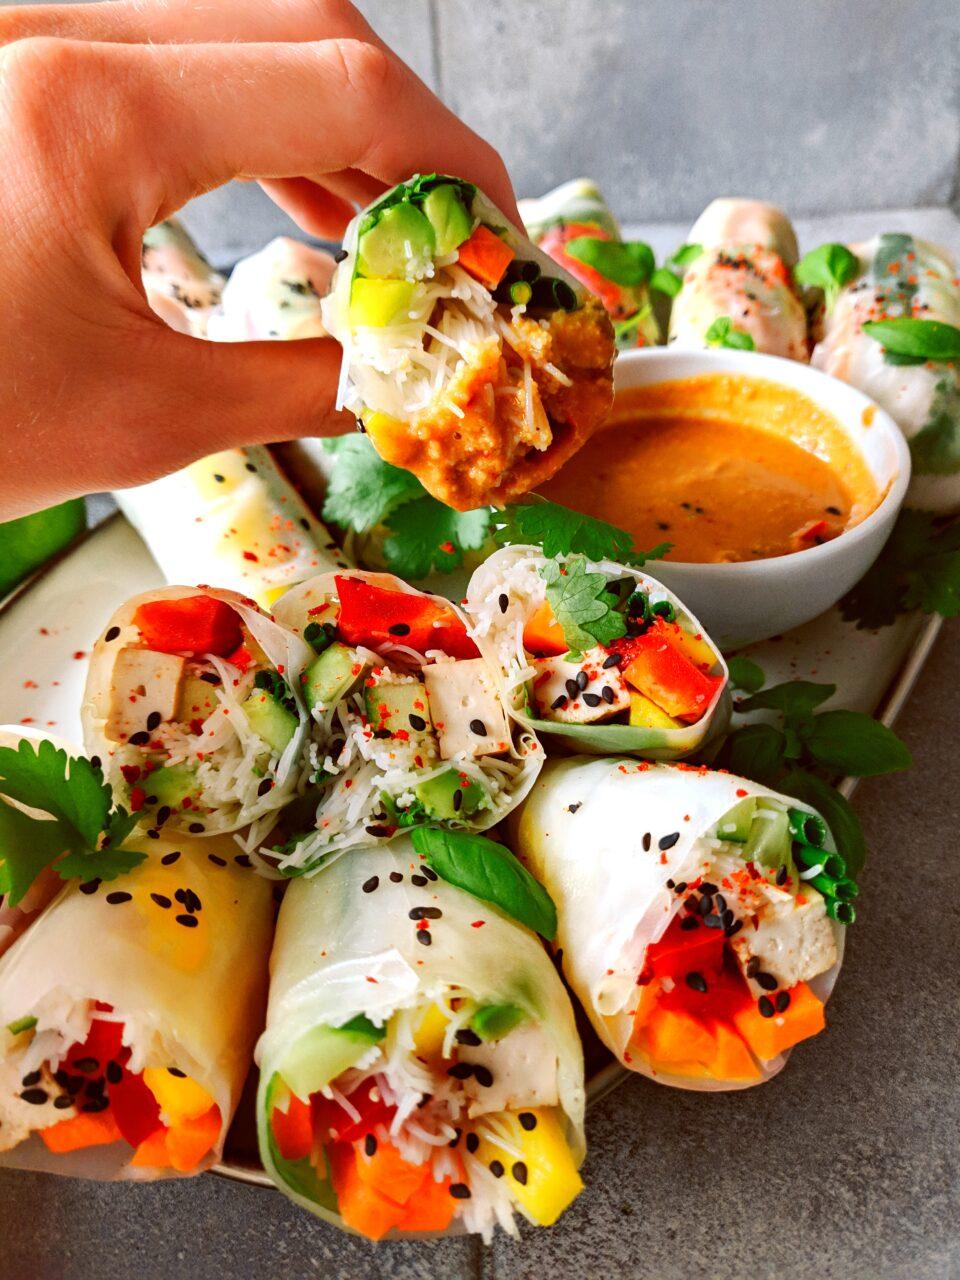 wegańskie rolki spring rolls meet without meat